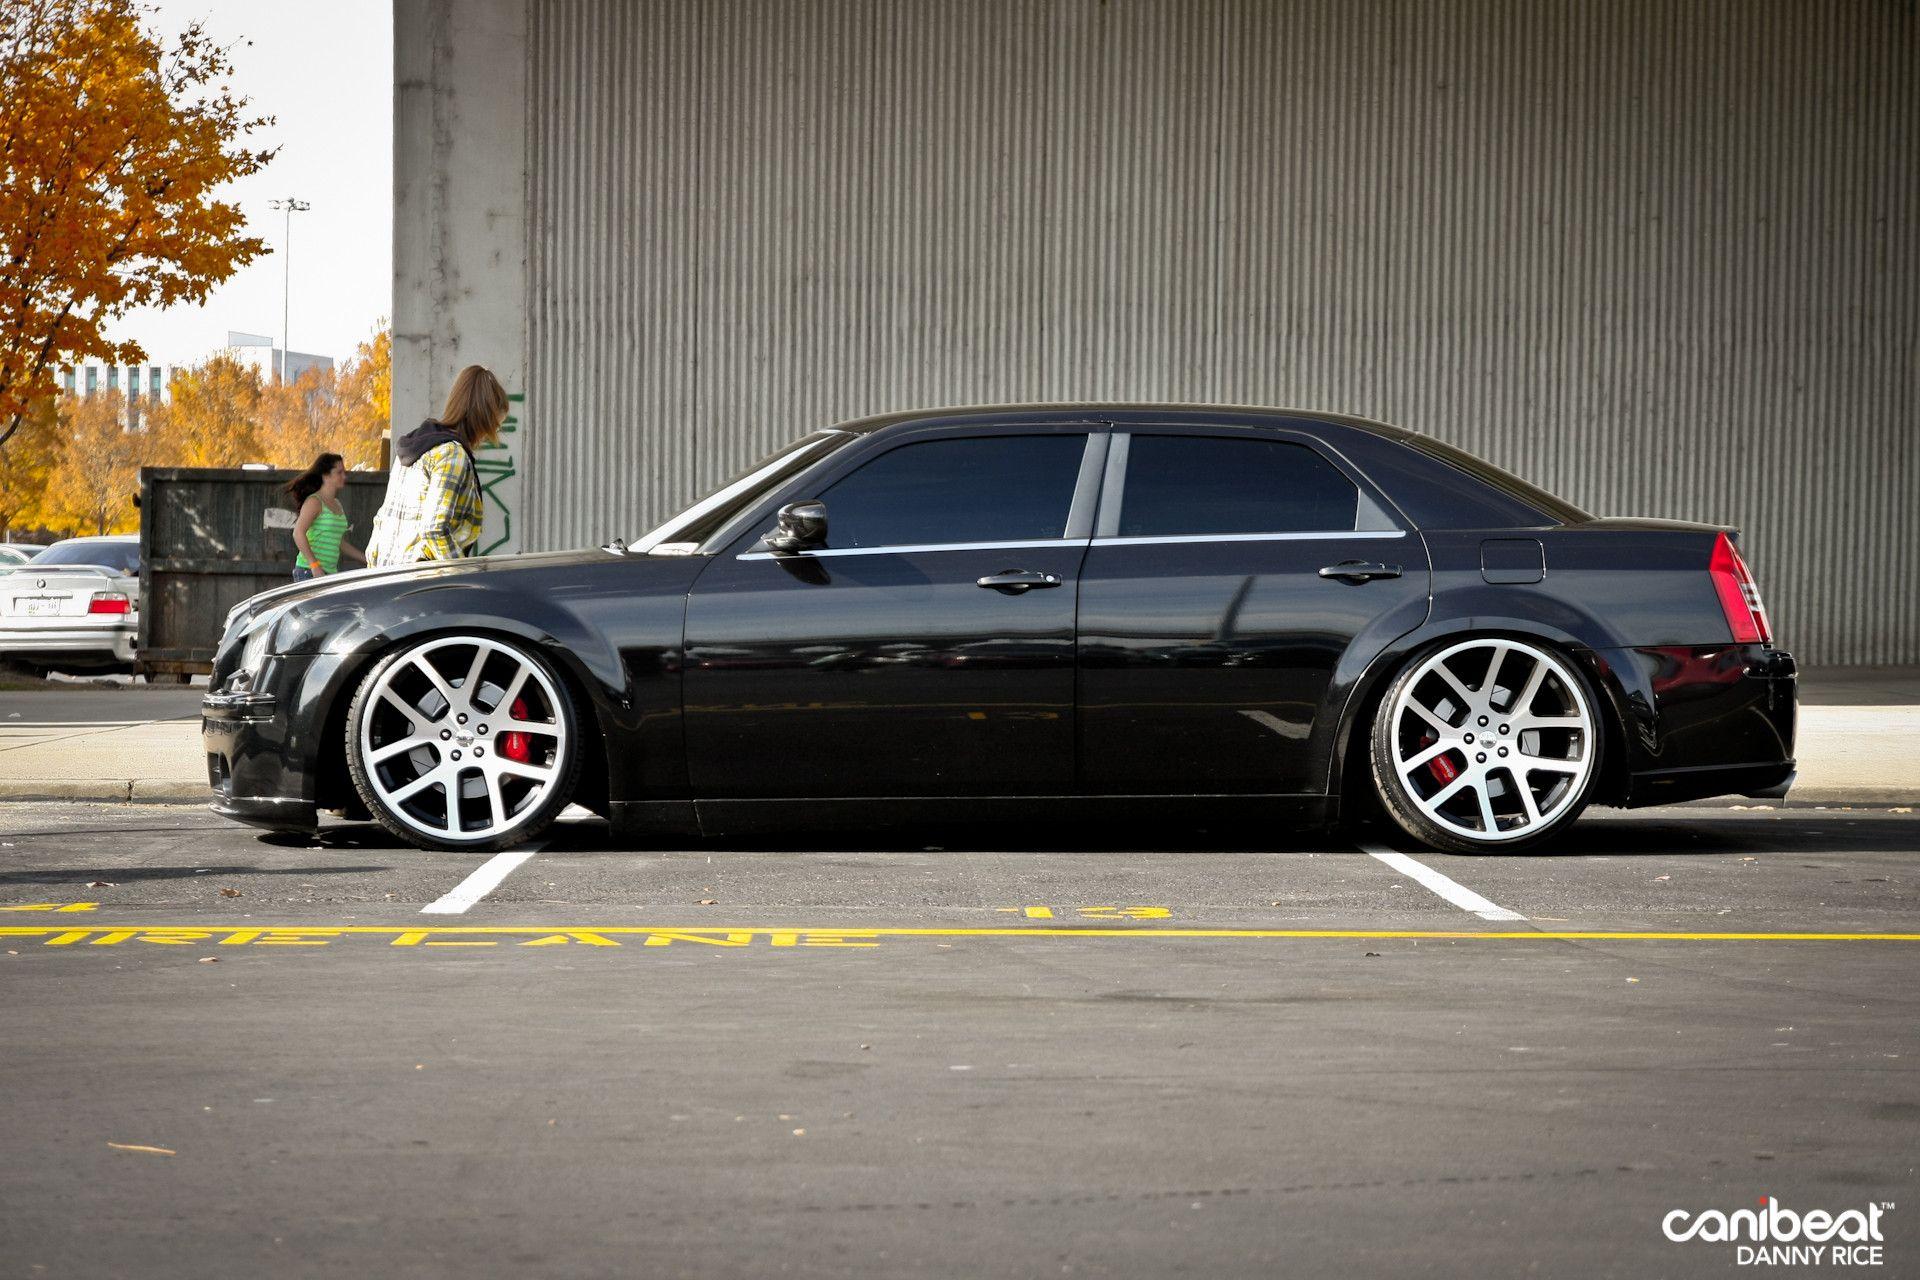 Black Custom Chrysler 300 1920x1280 Wallpaper Teahub Io